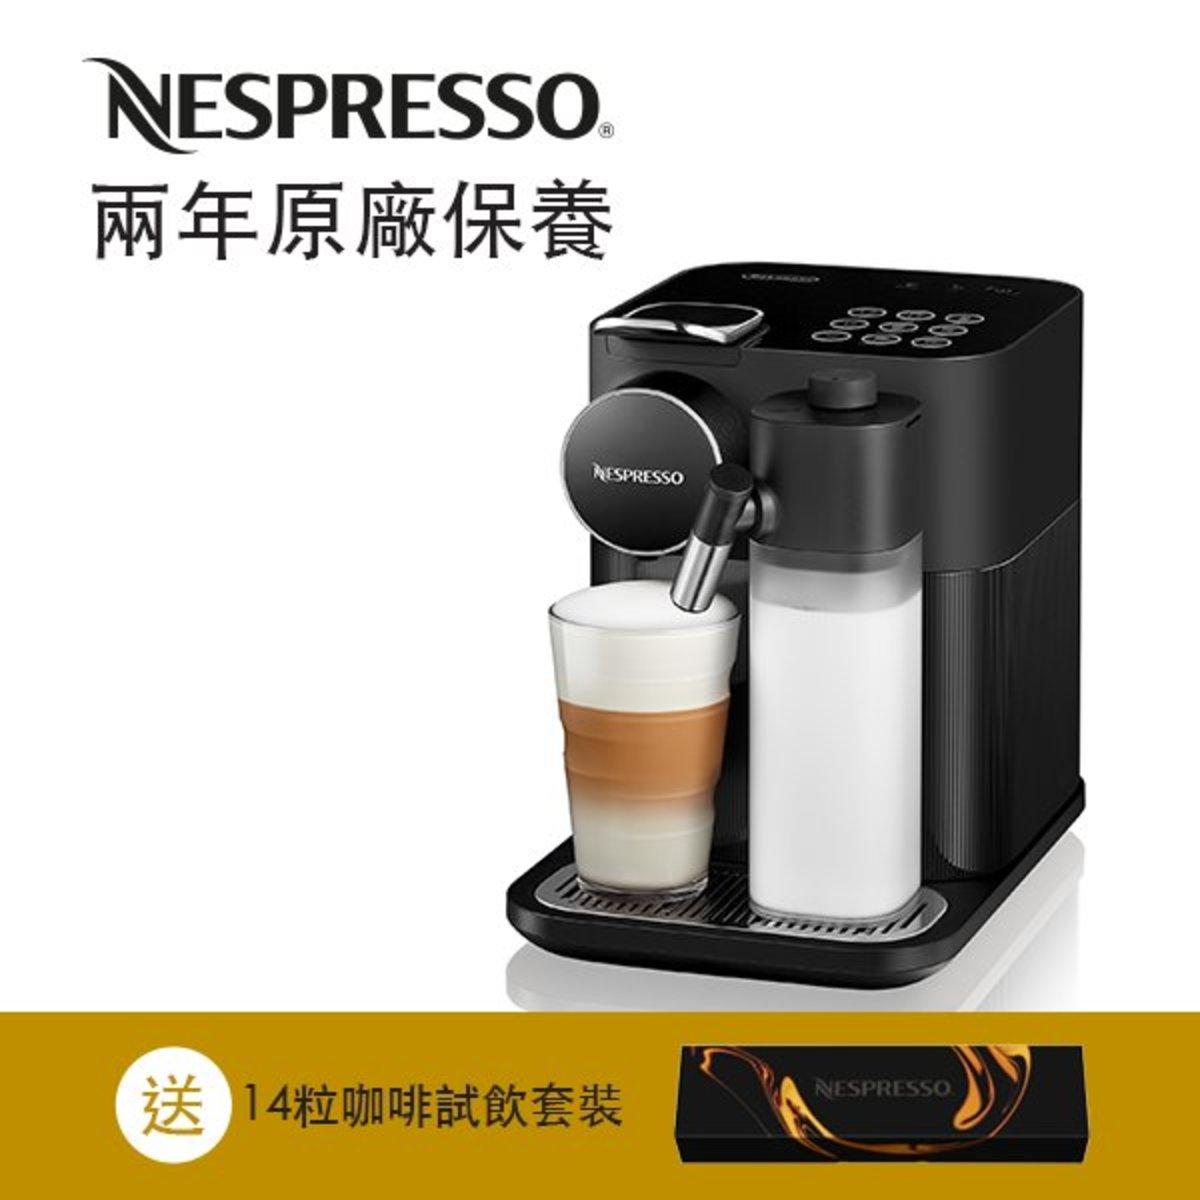 F531 Gran Lattissima 咖啡機, 雅致黑色